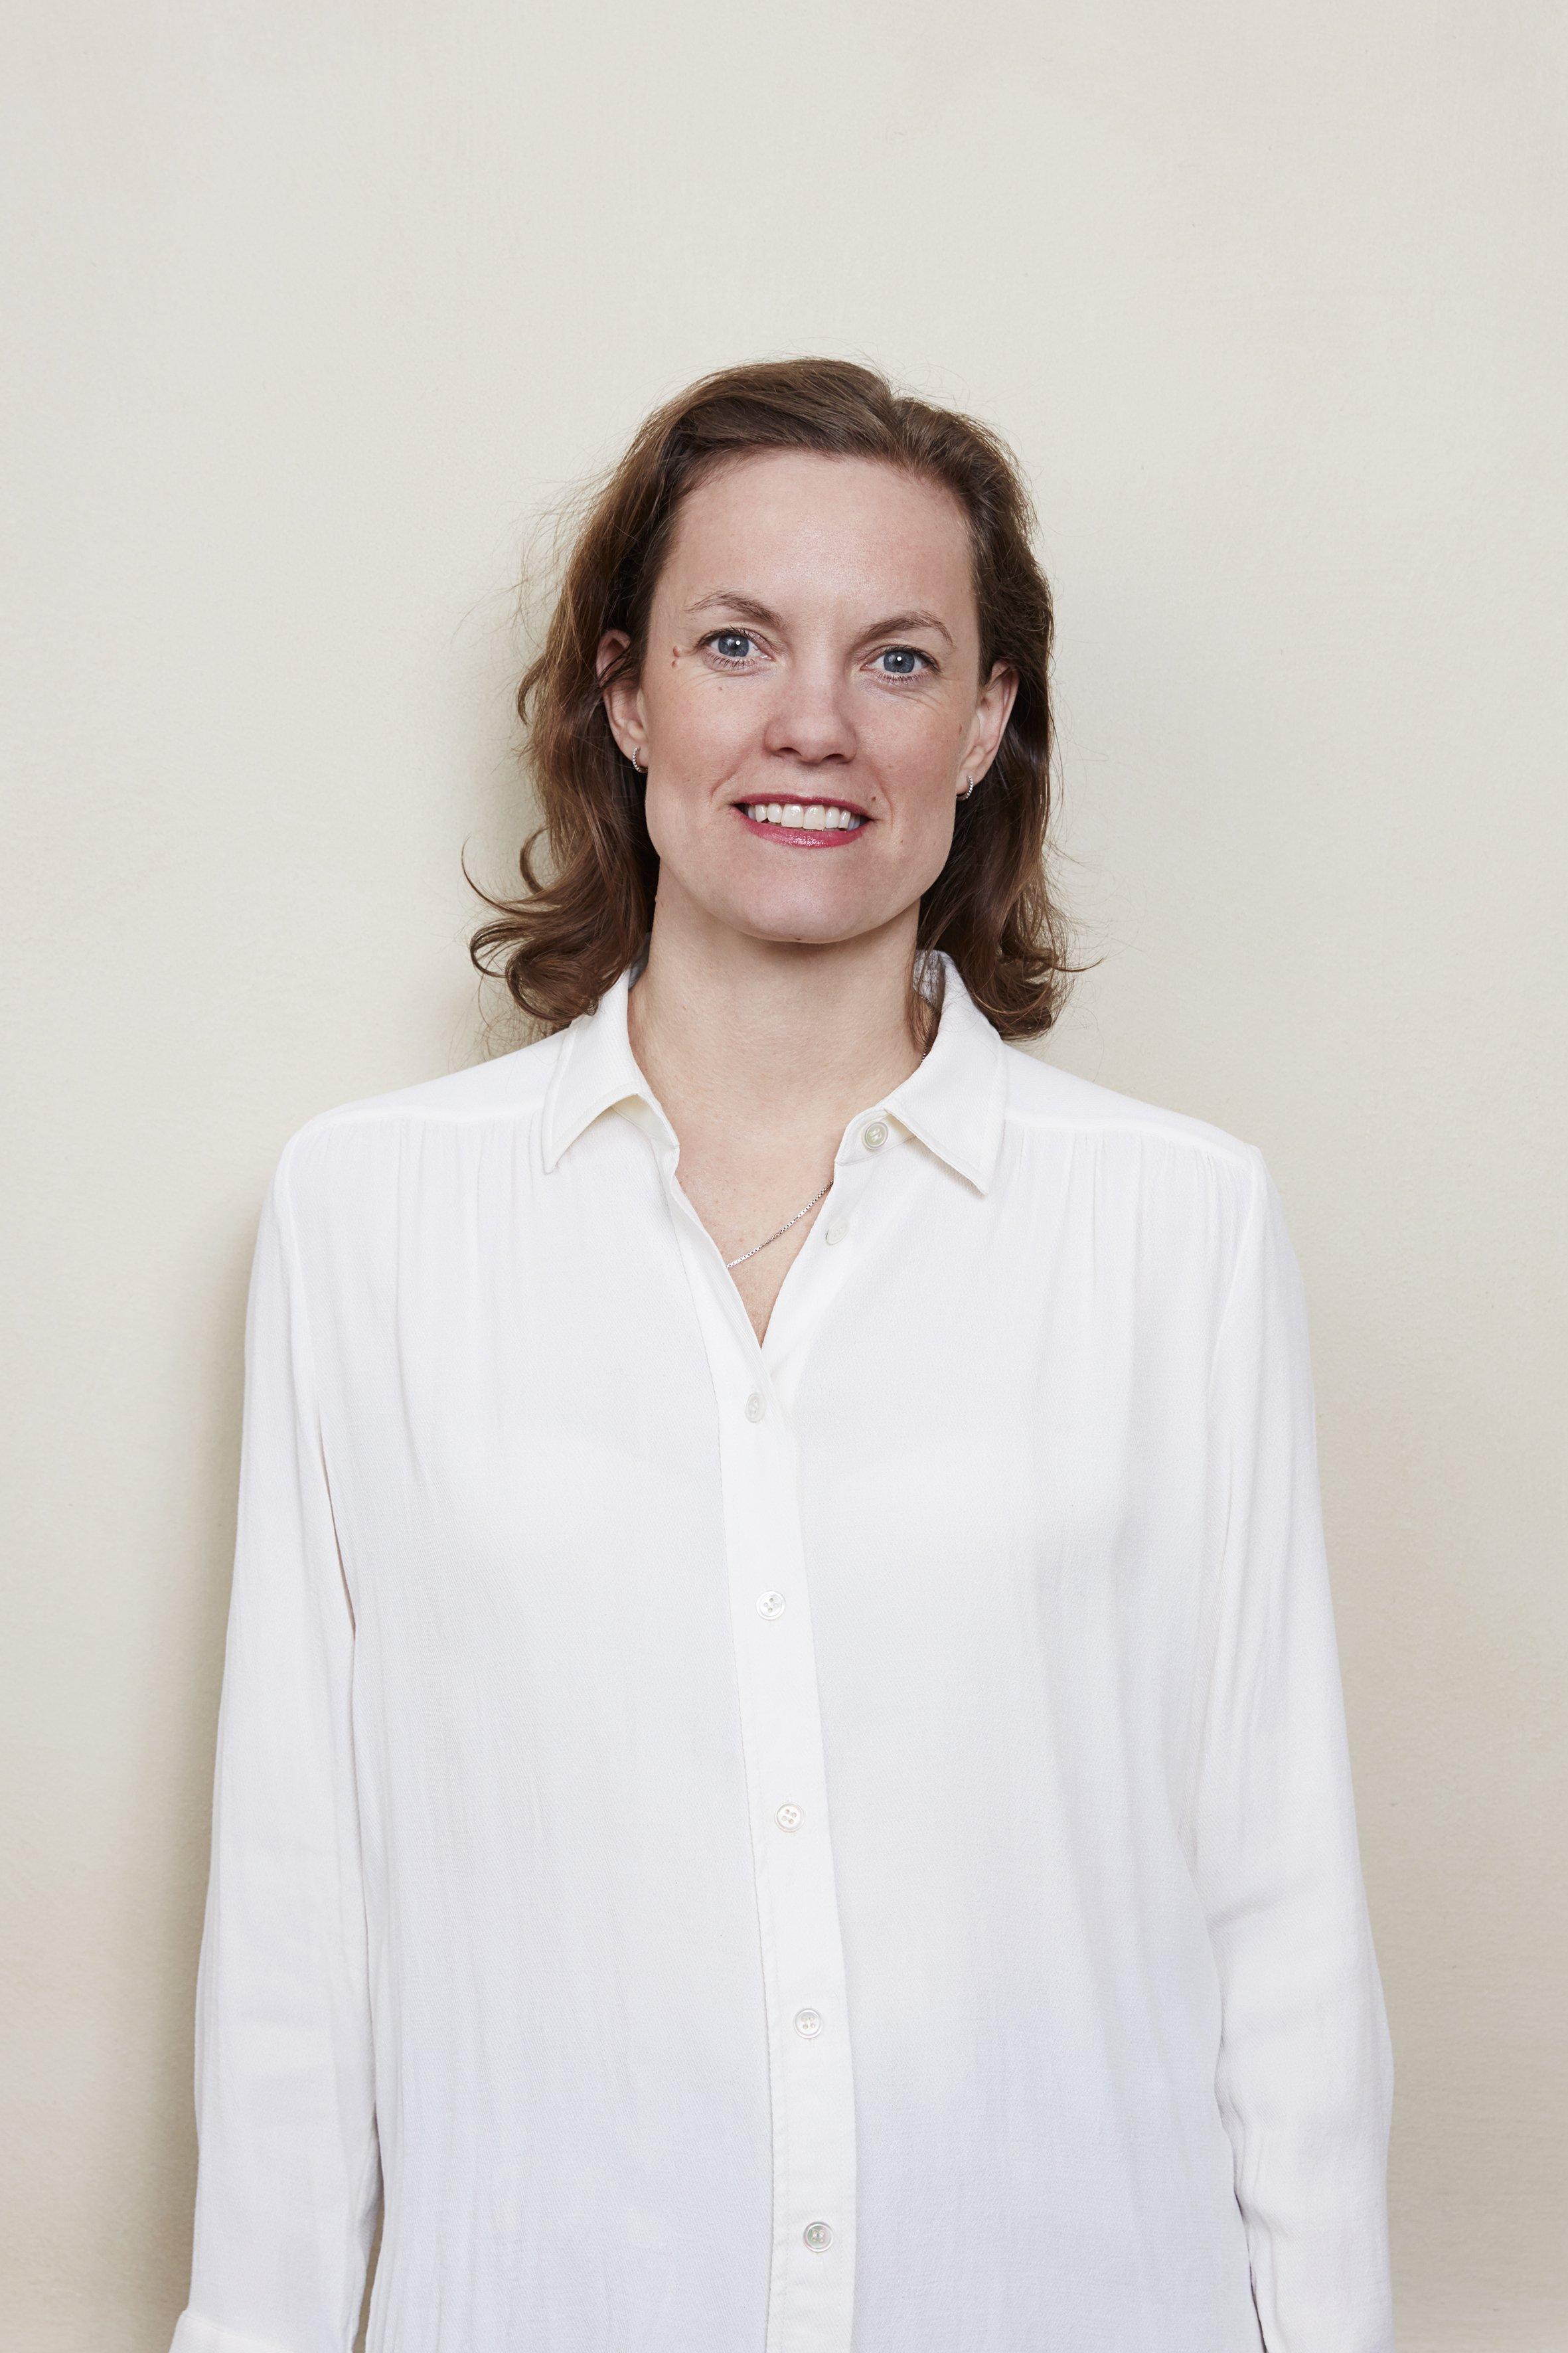 Jenny Blomberg climate strategist at ZeroMission